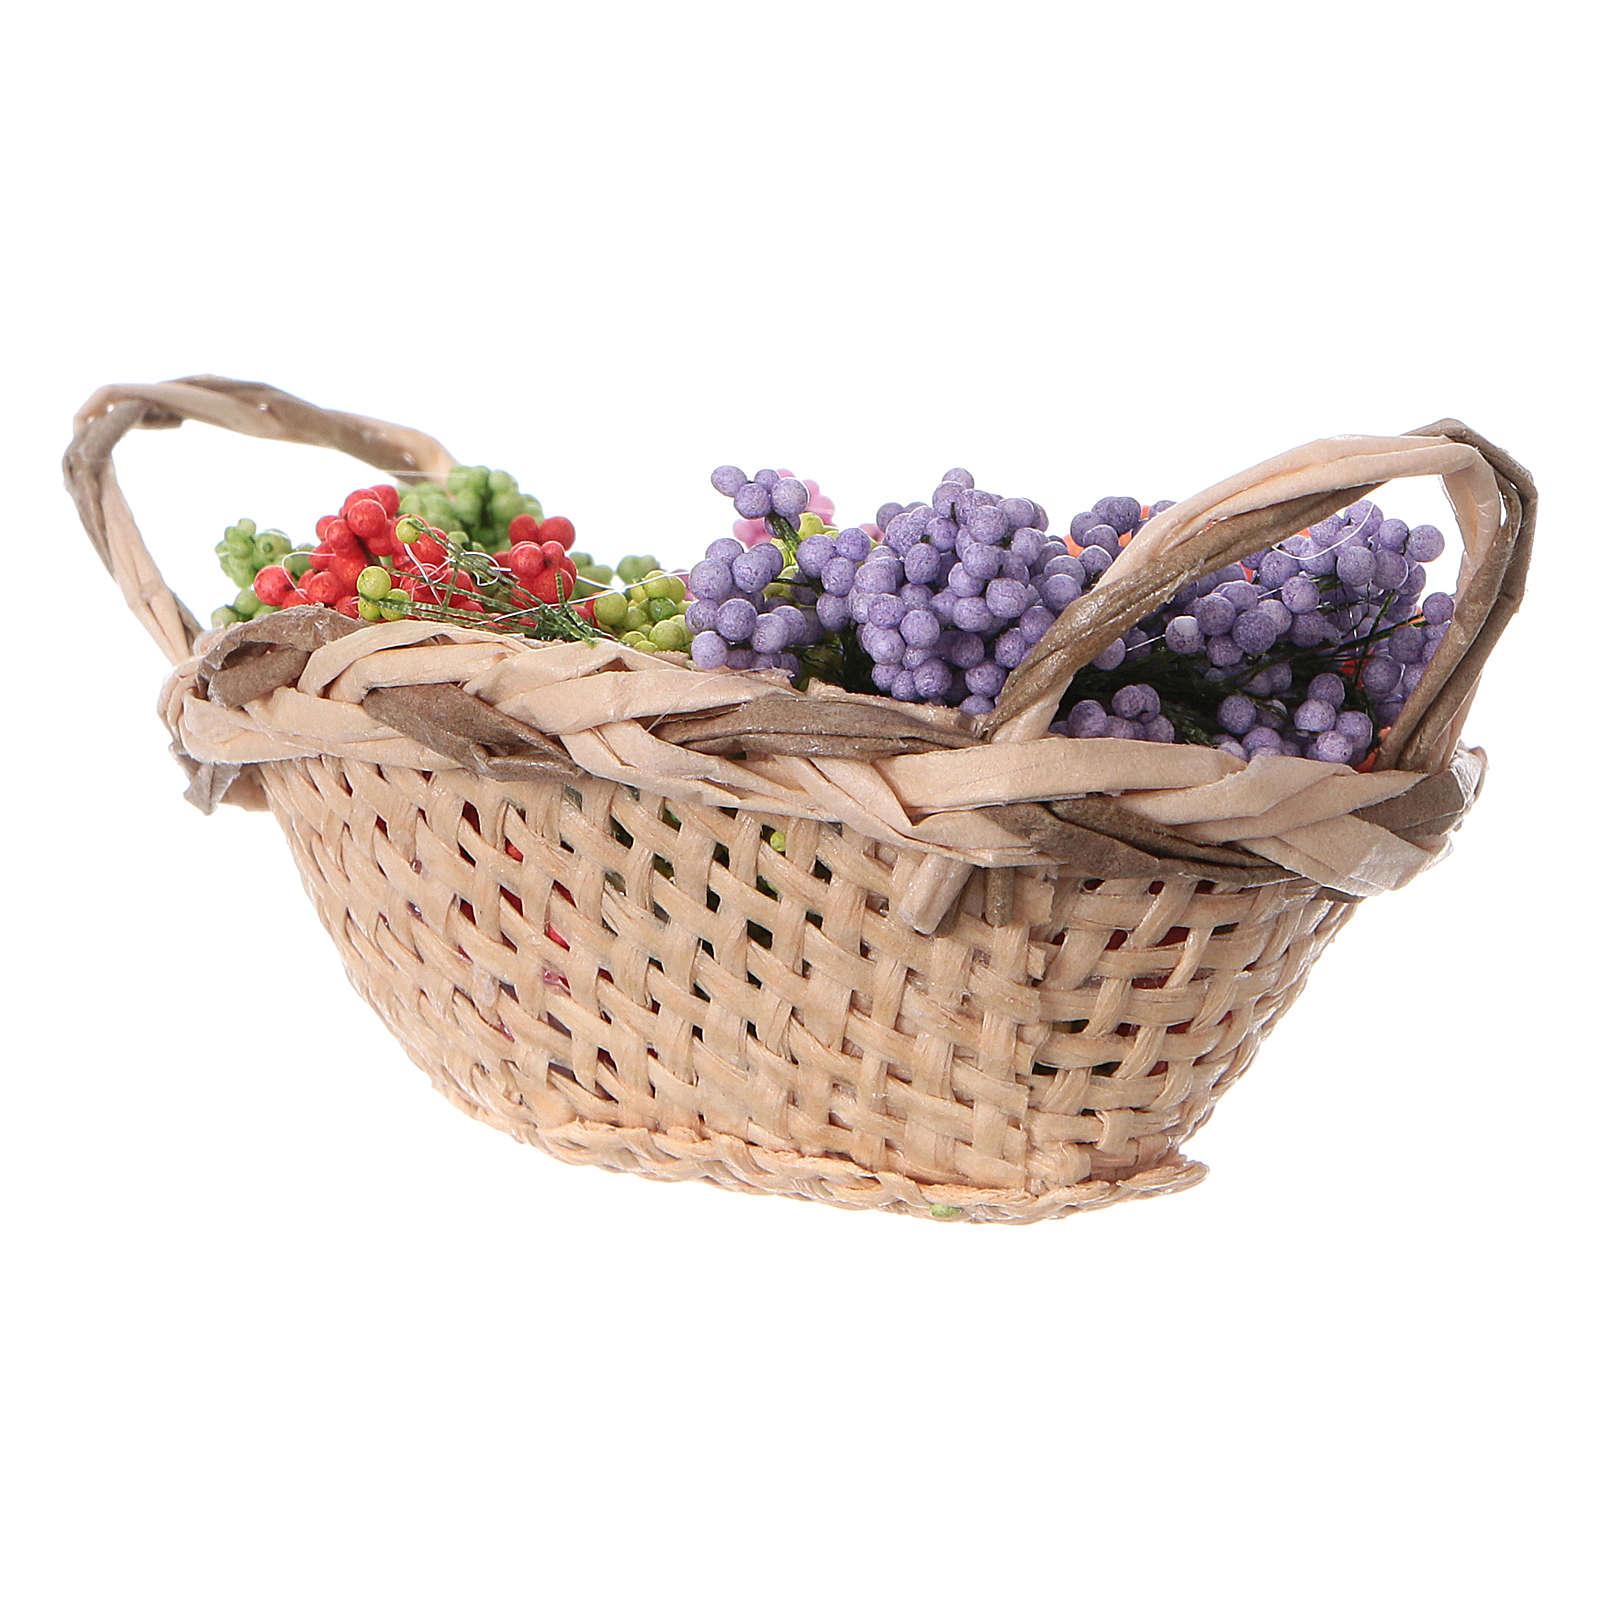 Cesta con flores para belén hecho con bricolaje h real 4 cm 4